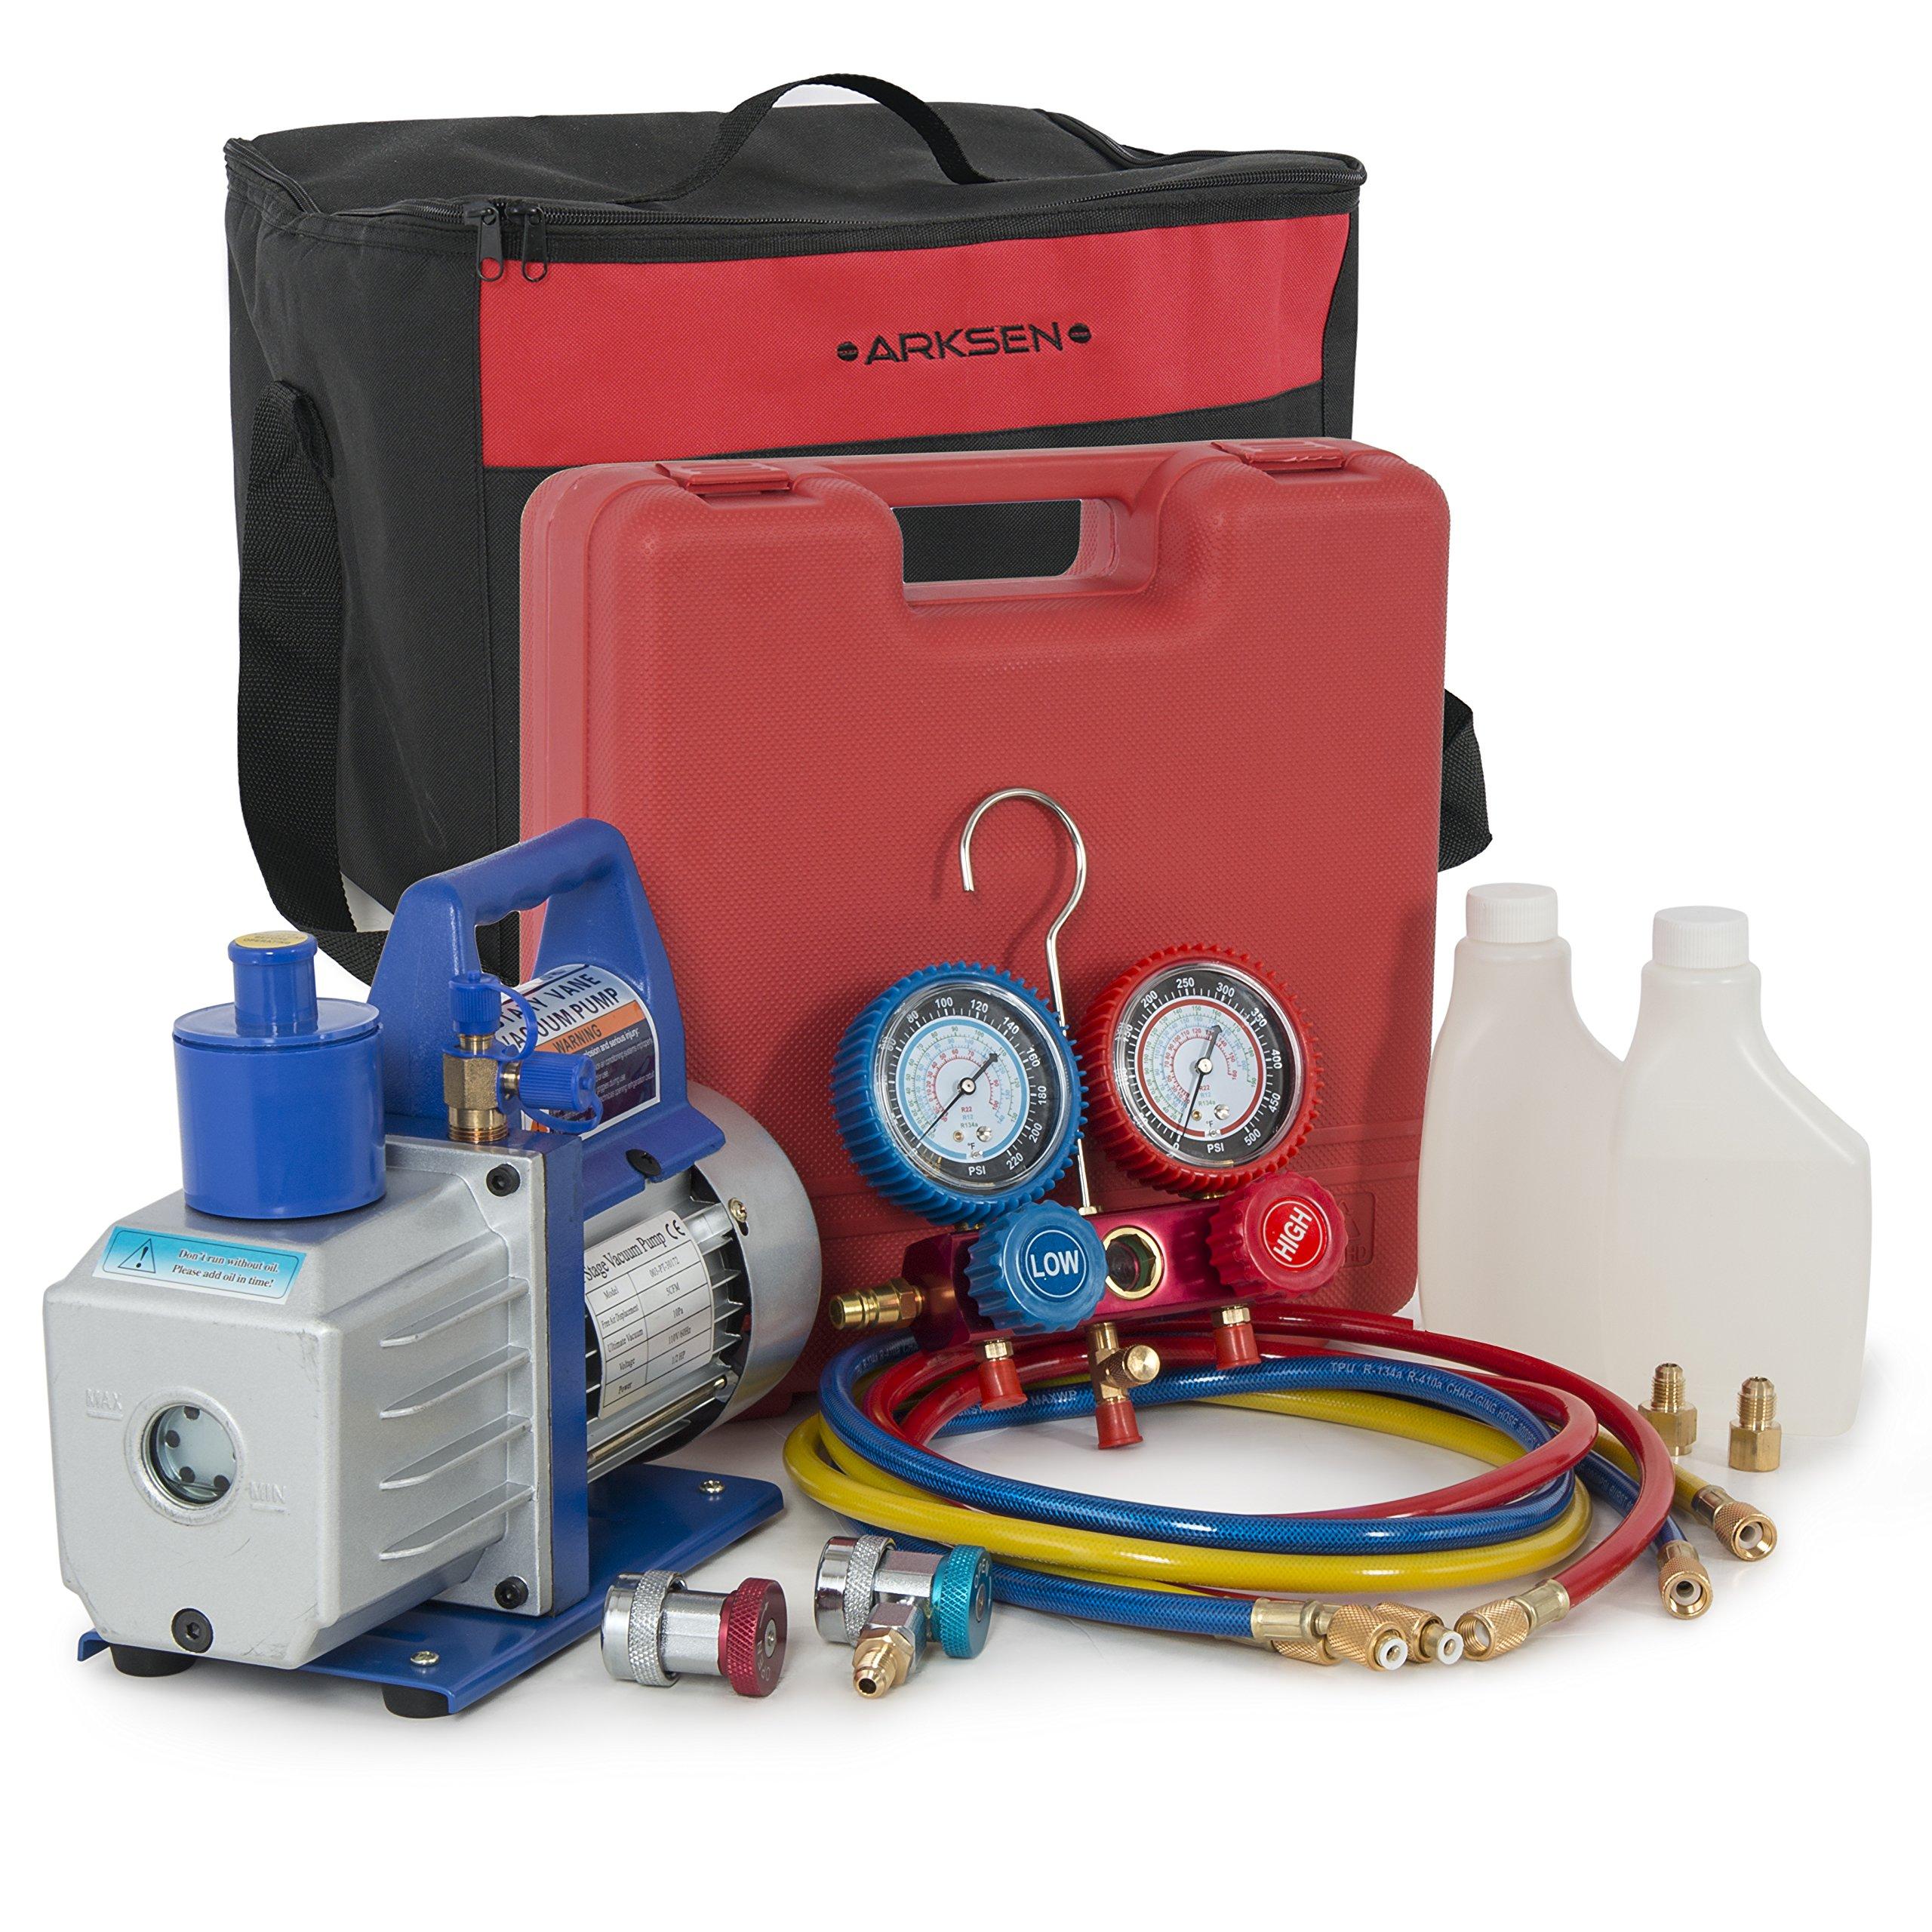 ARKSEN Vacuum Pump (1/2hp) A/C R134a Diagnostic Manifold Gauge Refrigerant w/ Carrying Tote Kit